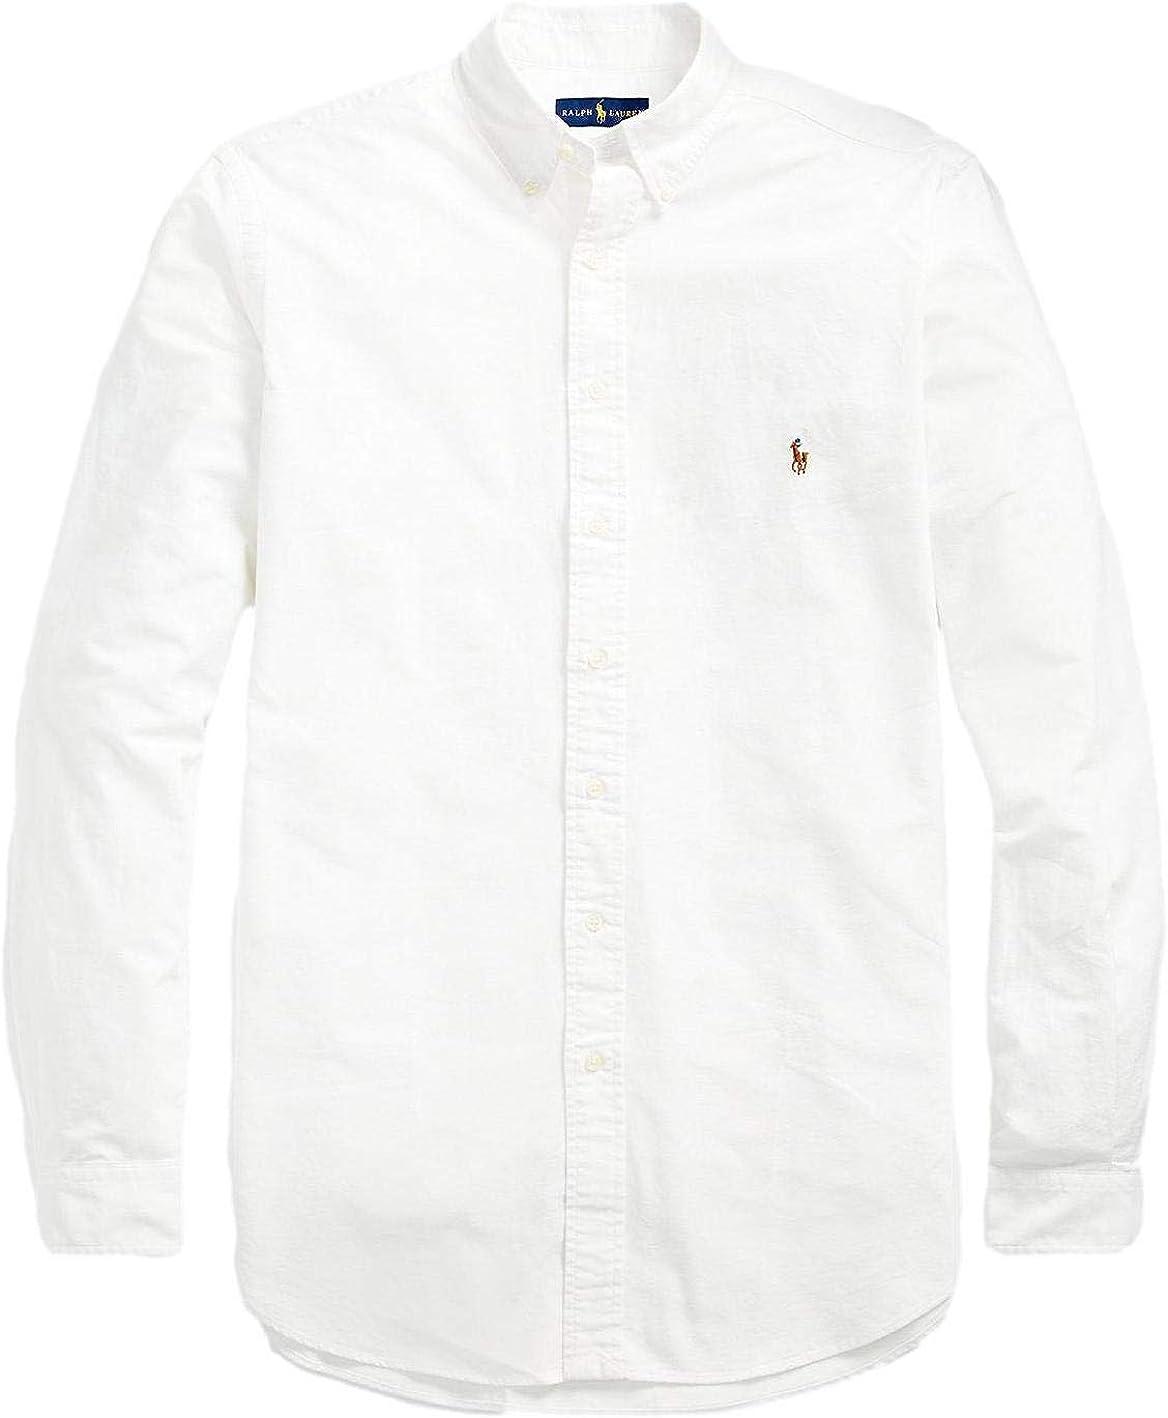 Polo Ralph Lauren Men's Big and Tall Long-Sleeve Solid Oxford Shirt (3LT)